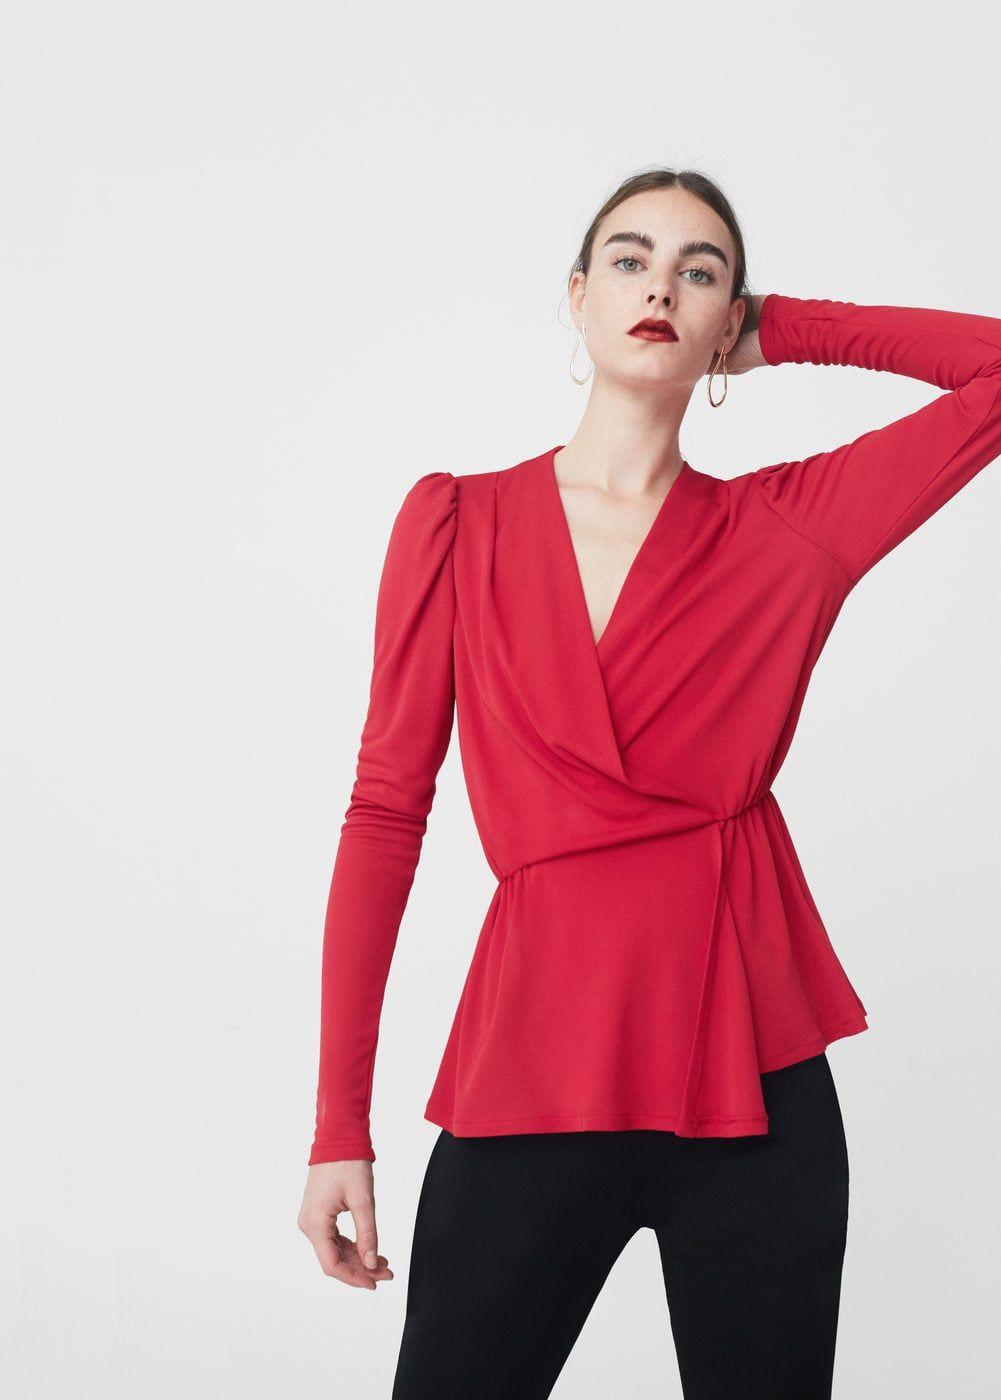 b5b14458372 Blusa cruzada - Mujer en 2019 | Outfits | Blusas cruzadas, Blusas y ...